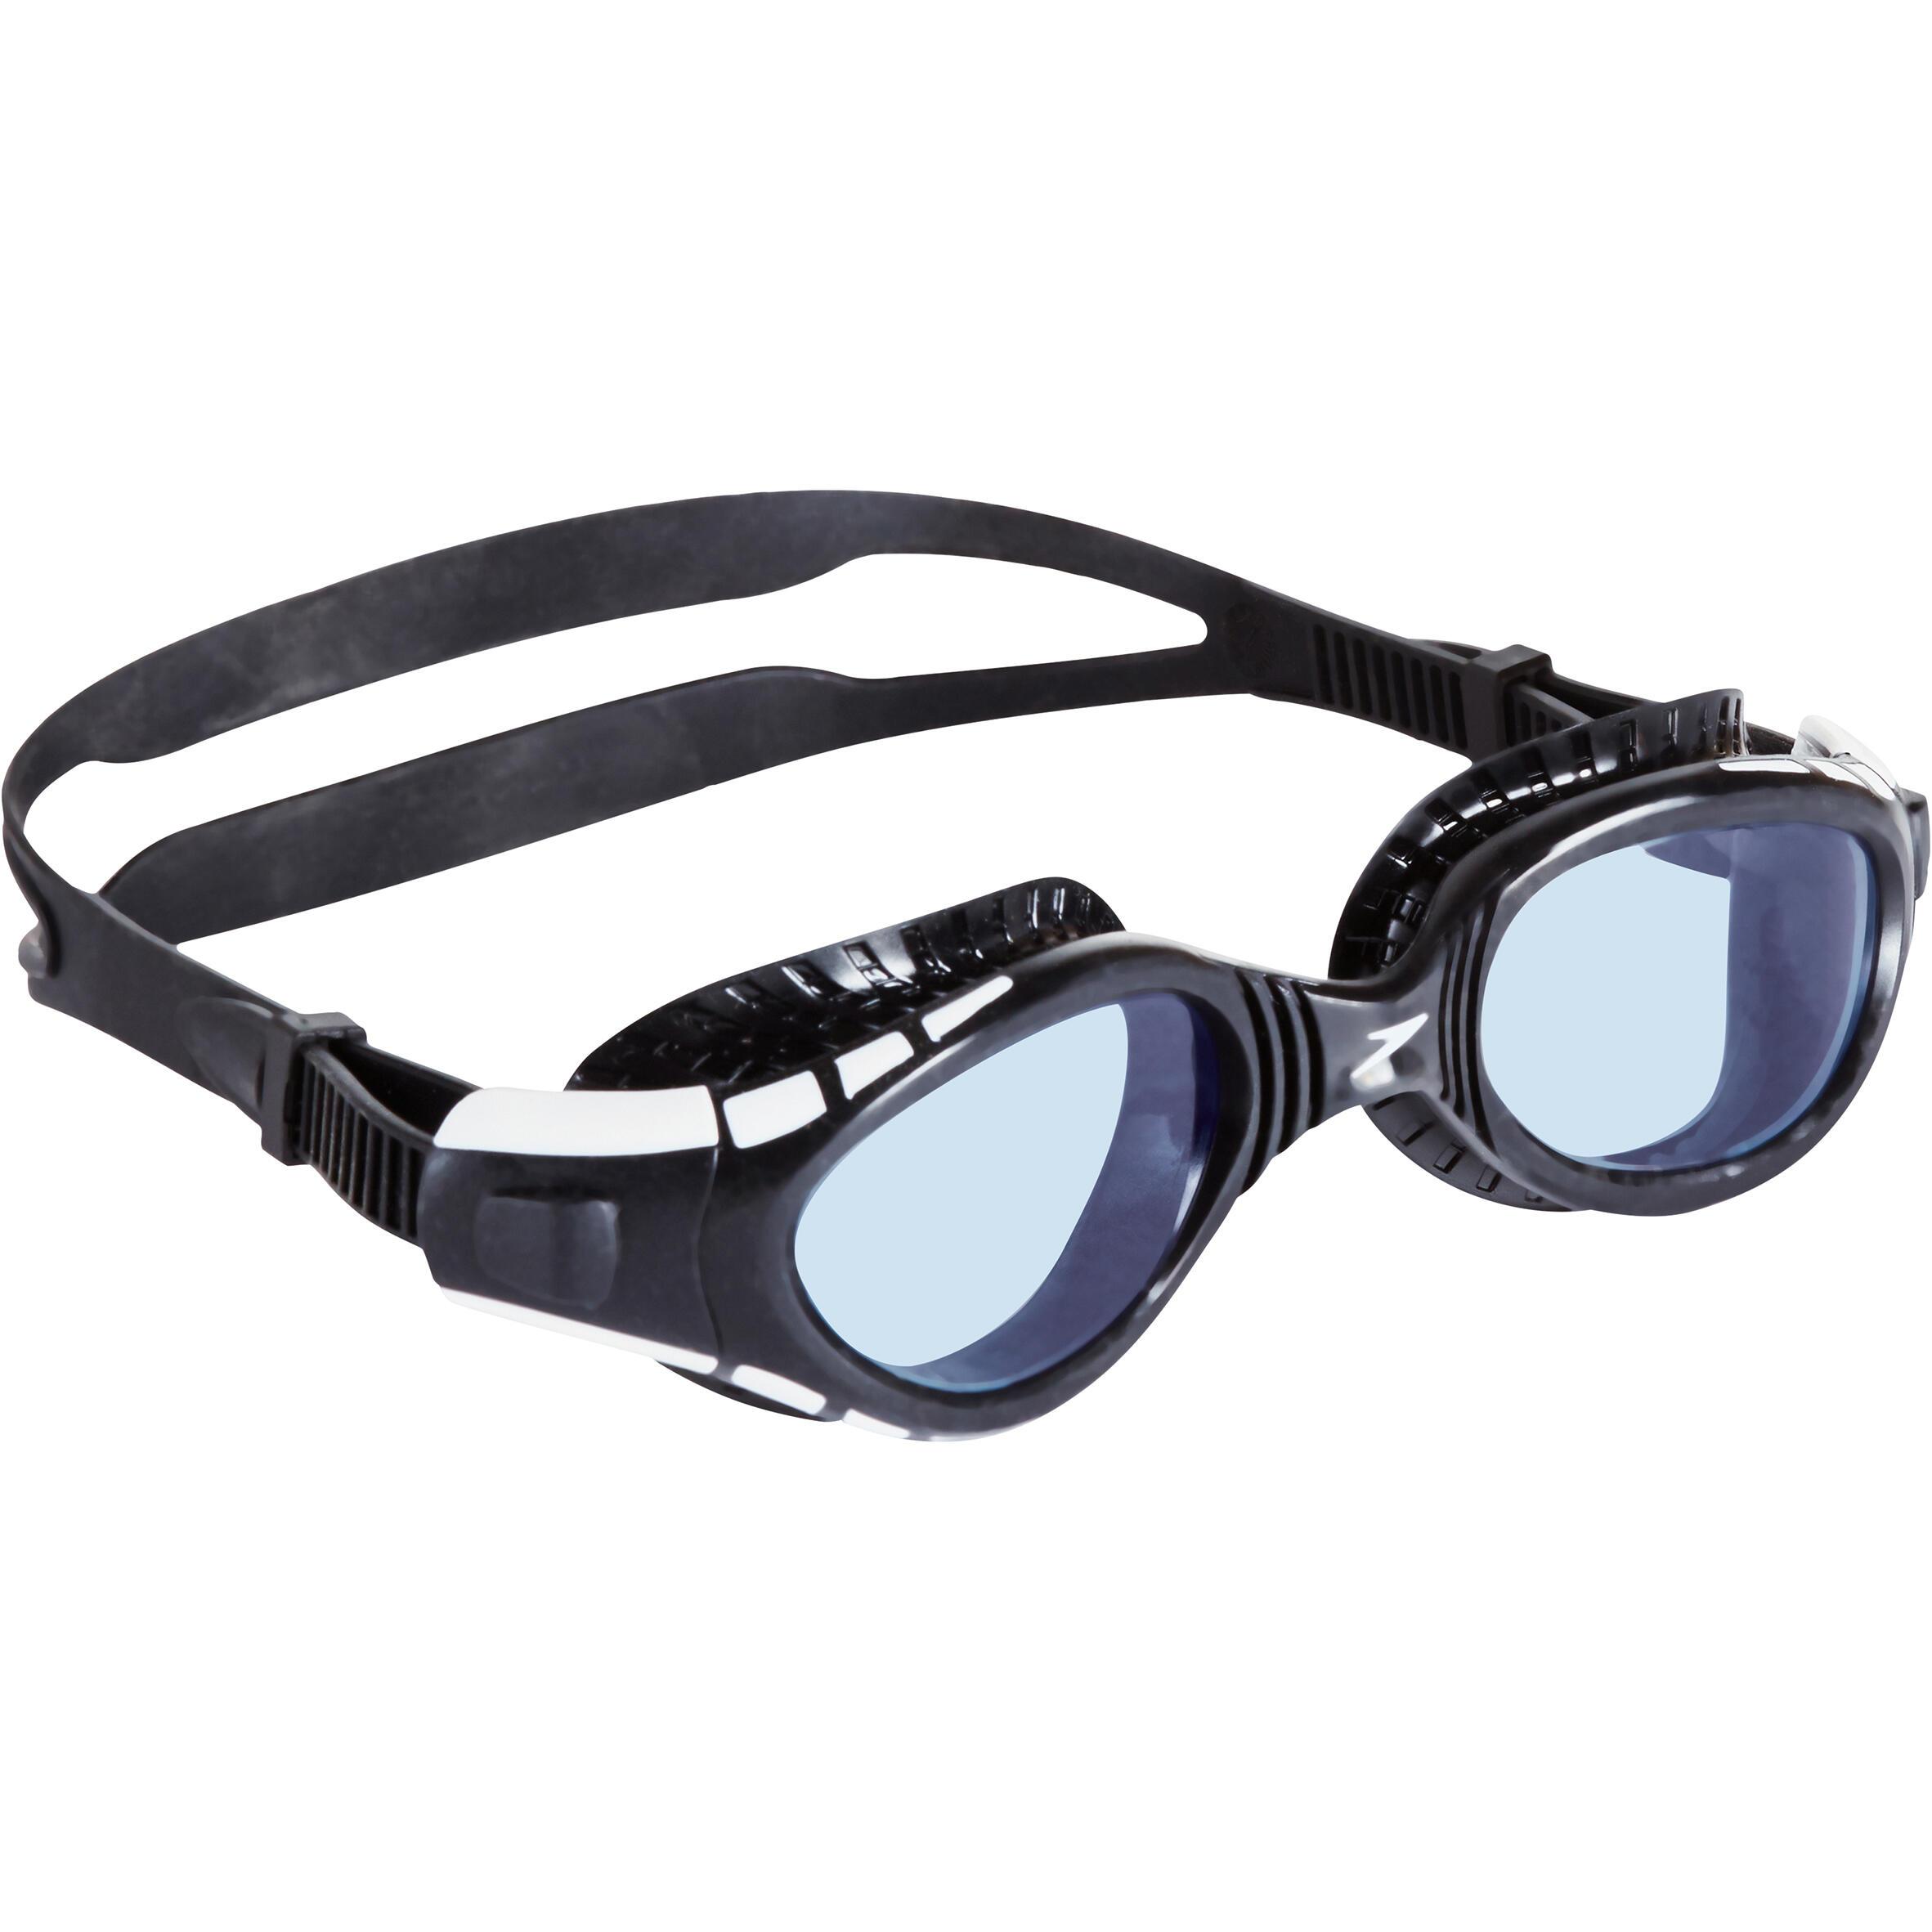 2b91c9a3a25a10 Speedo Zwembril Futura BioFuse Flexiseal getint zwart | Decathlon.nl